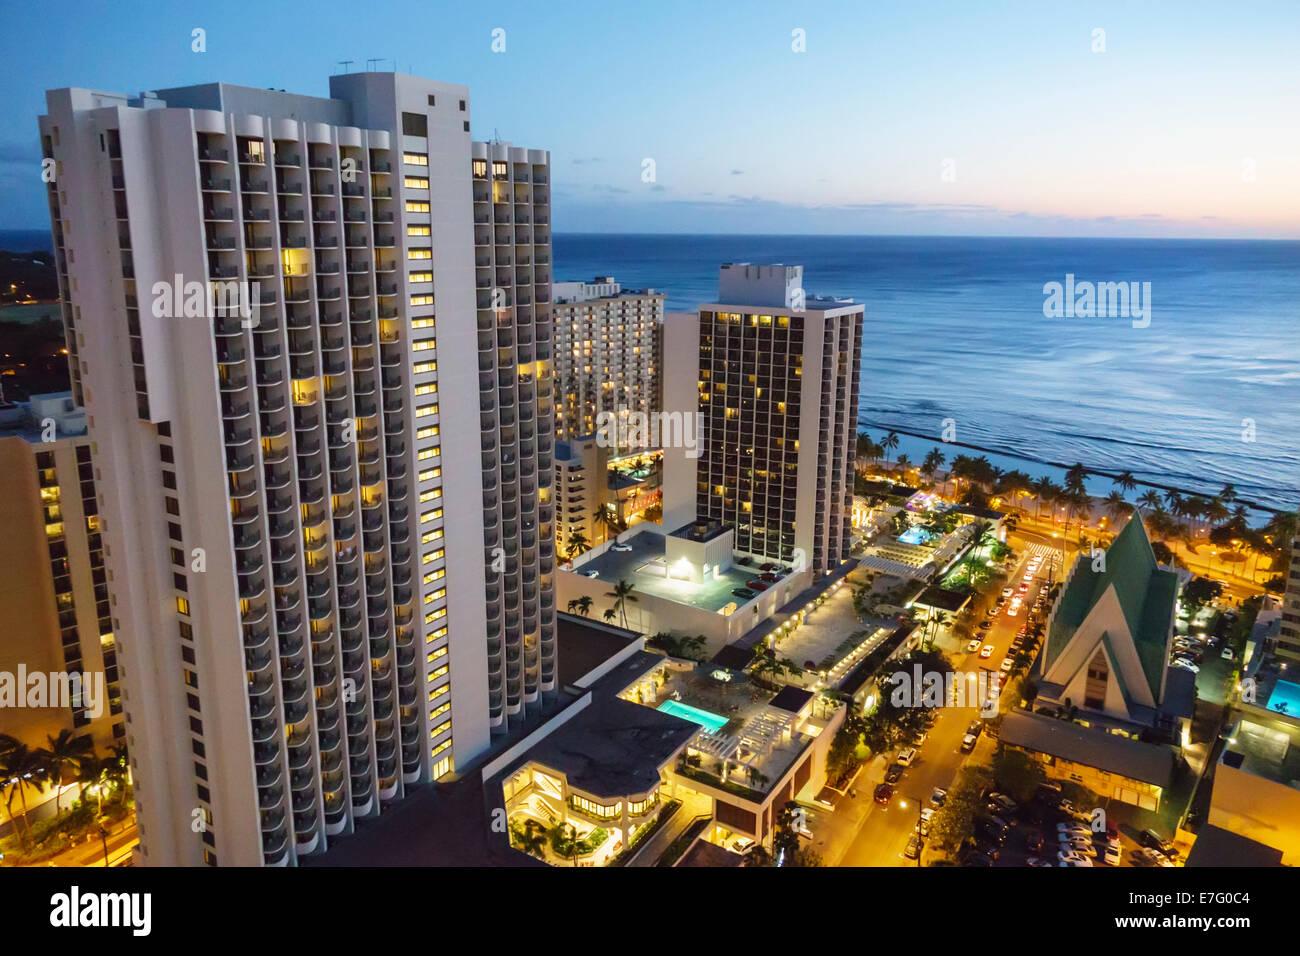 Hawaii Hawaiian Honolulu Waikiki Beach Pacific Ocean High Rise Stock